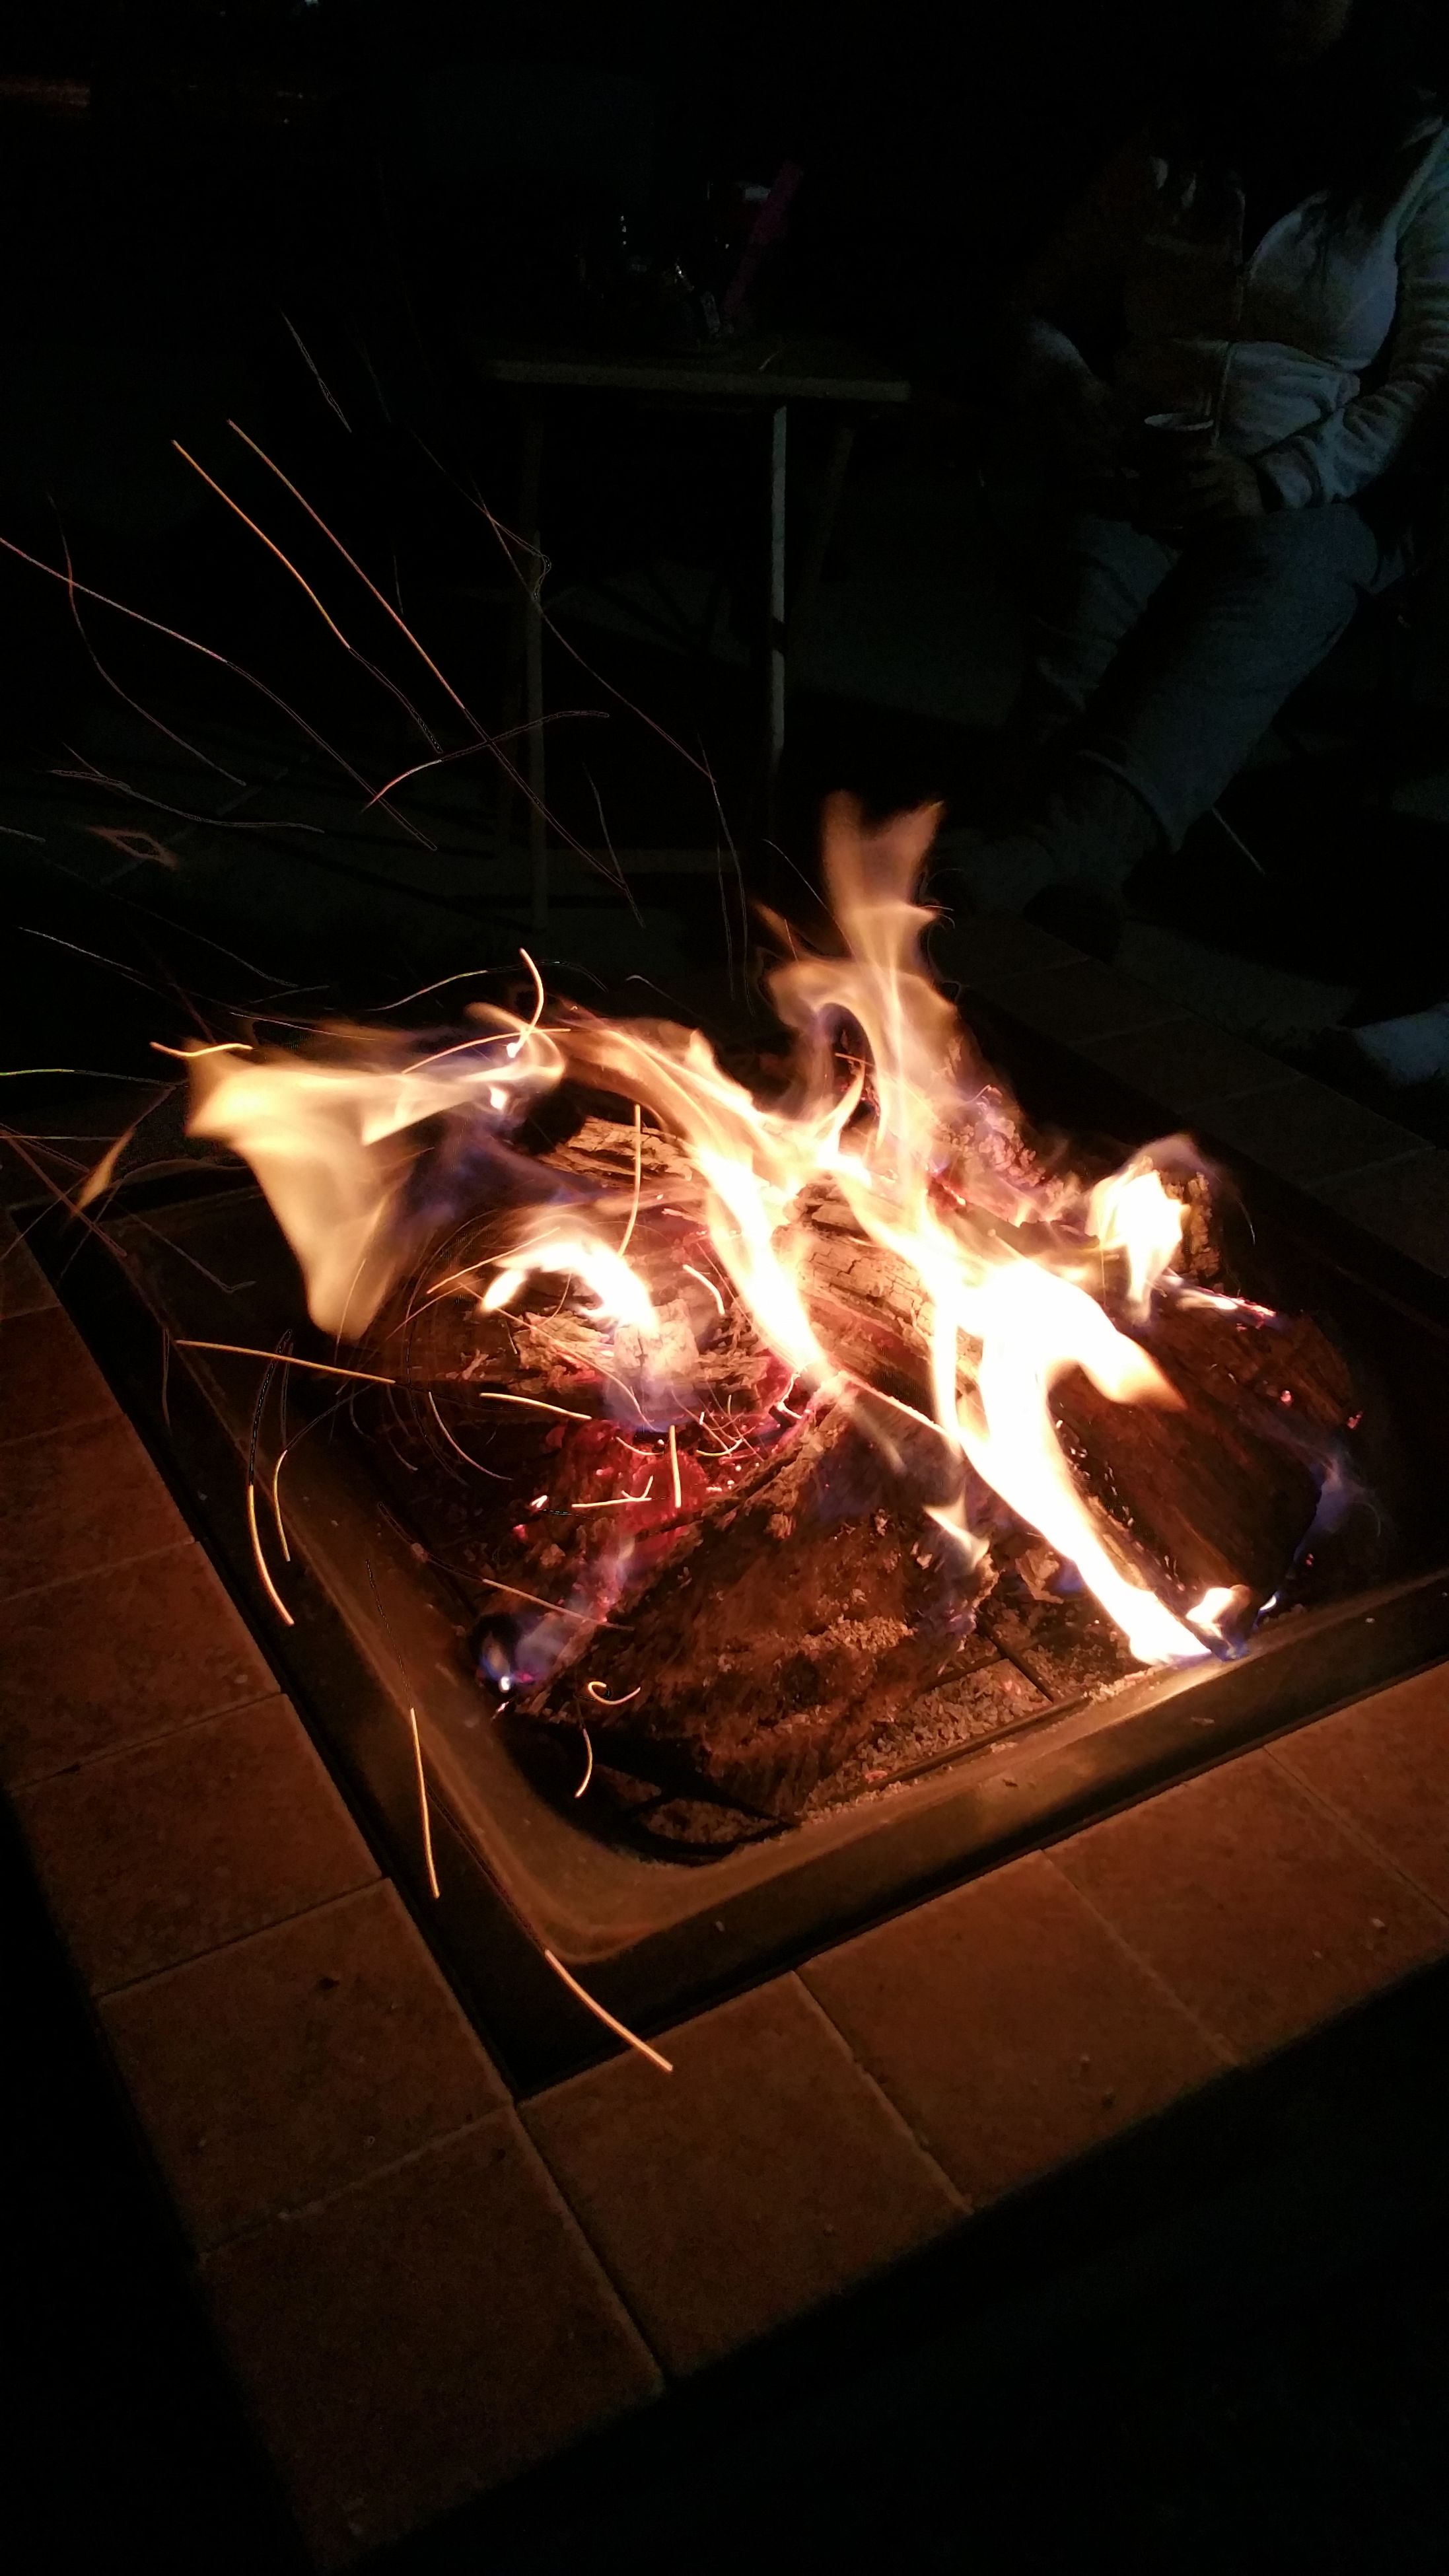 night, burning, fire - natural phenomenon, flame, indoors, heat - temperature, illuminated, lifestyles, standing, leisure activity, glowing, dark, light - natural phenomenon, bonfire, fire, sitting, men, person